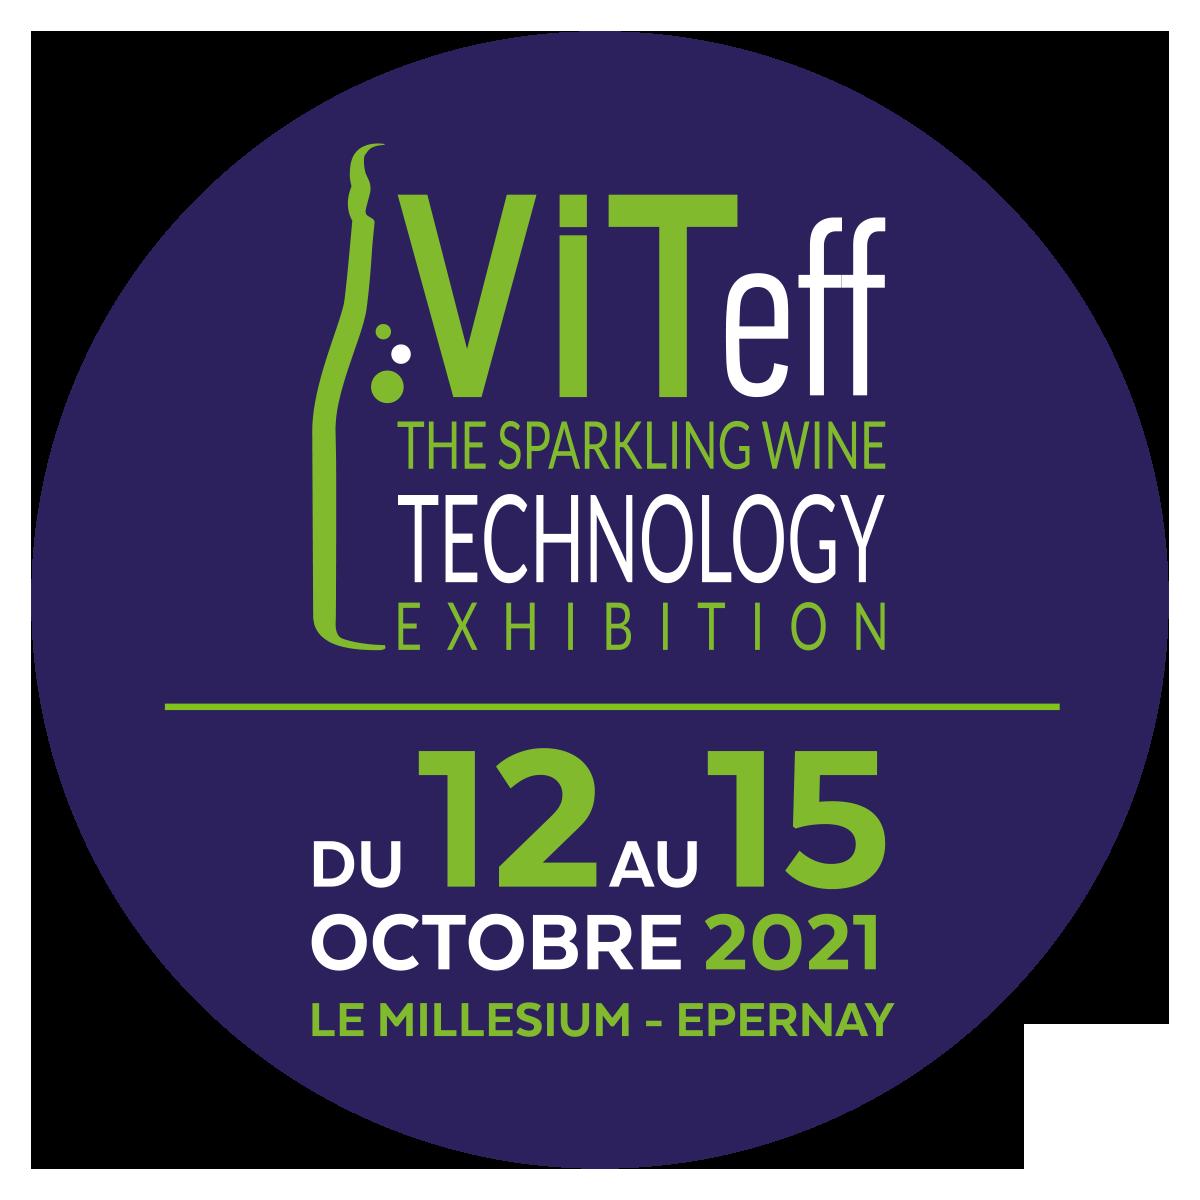 GALLOREMA présent au VITEFF 2021